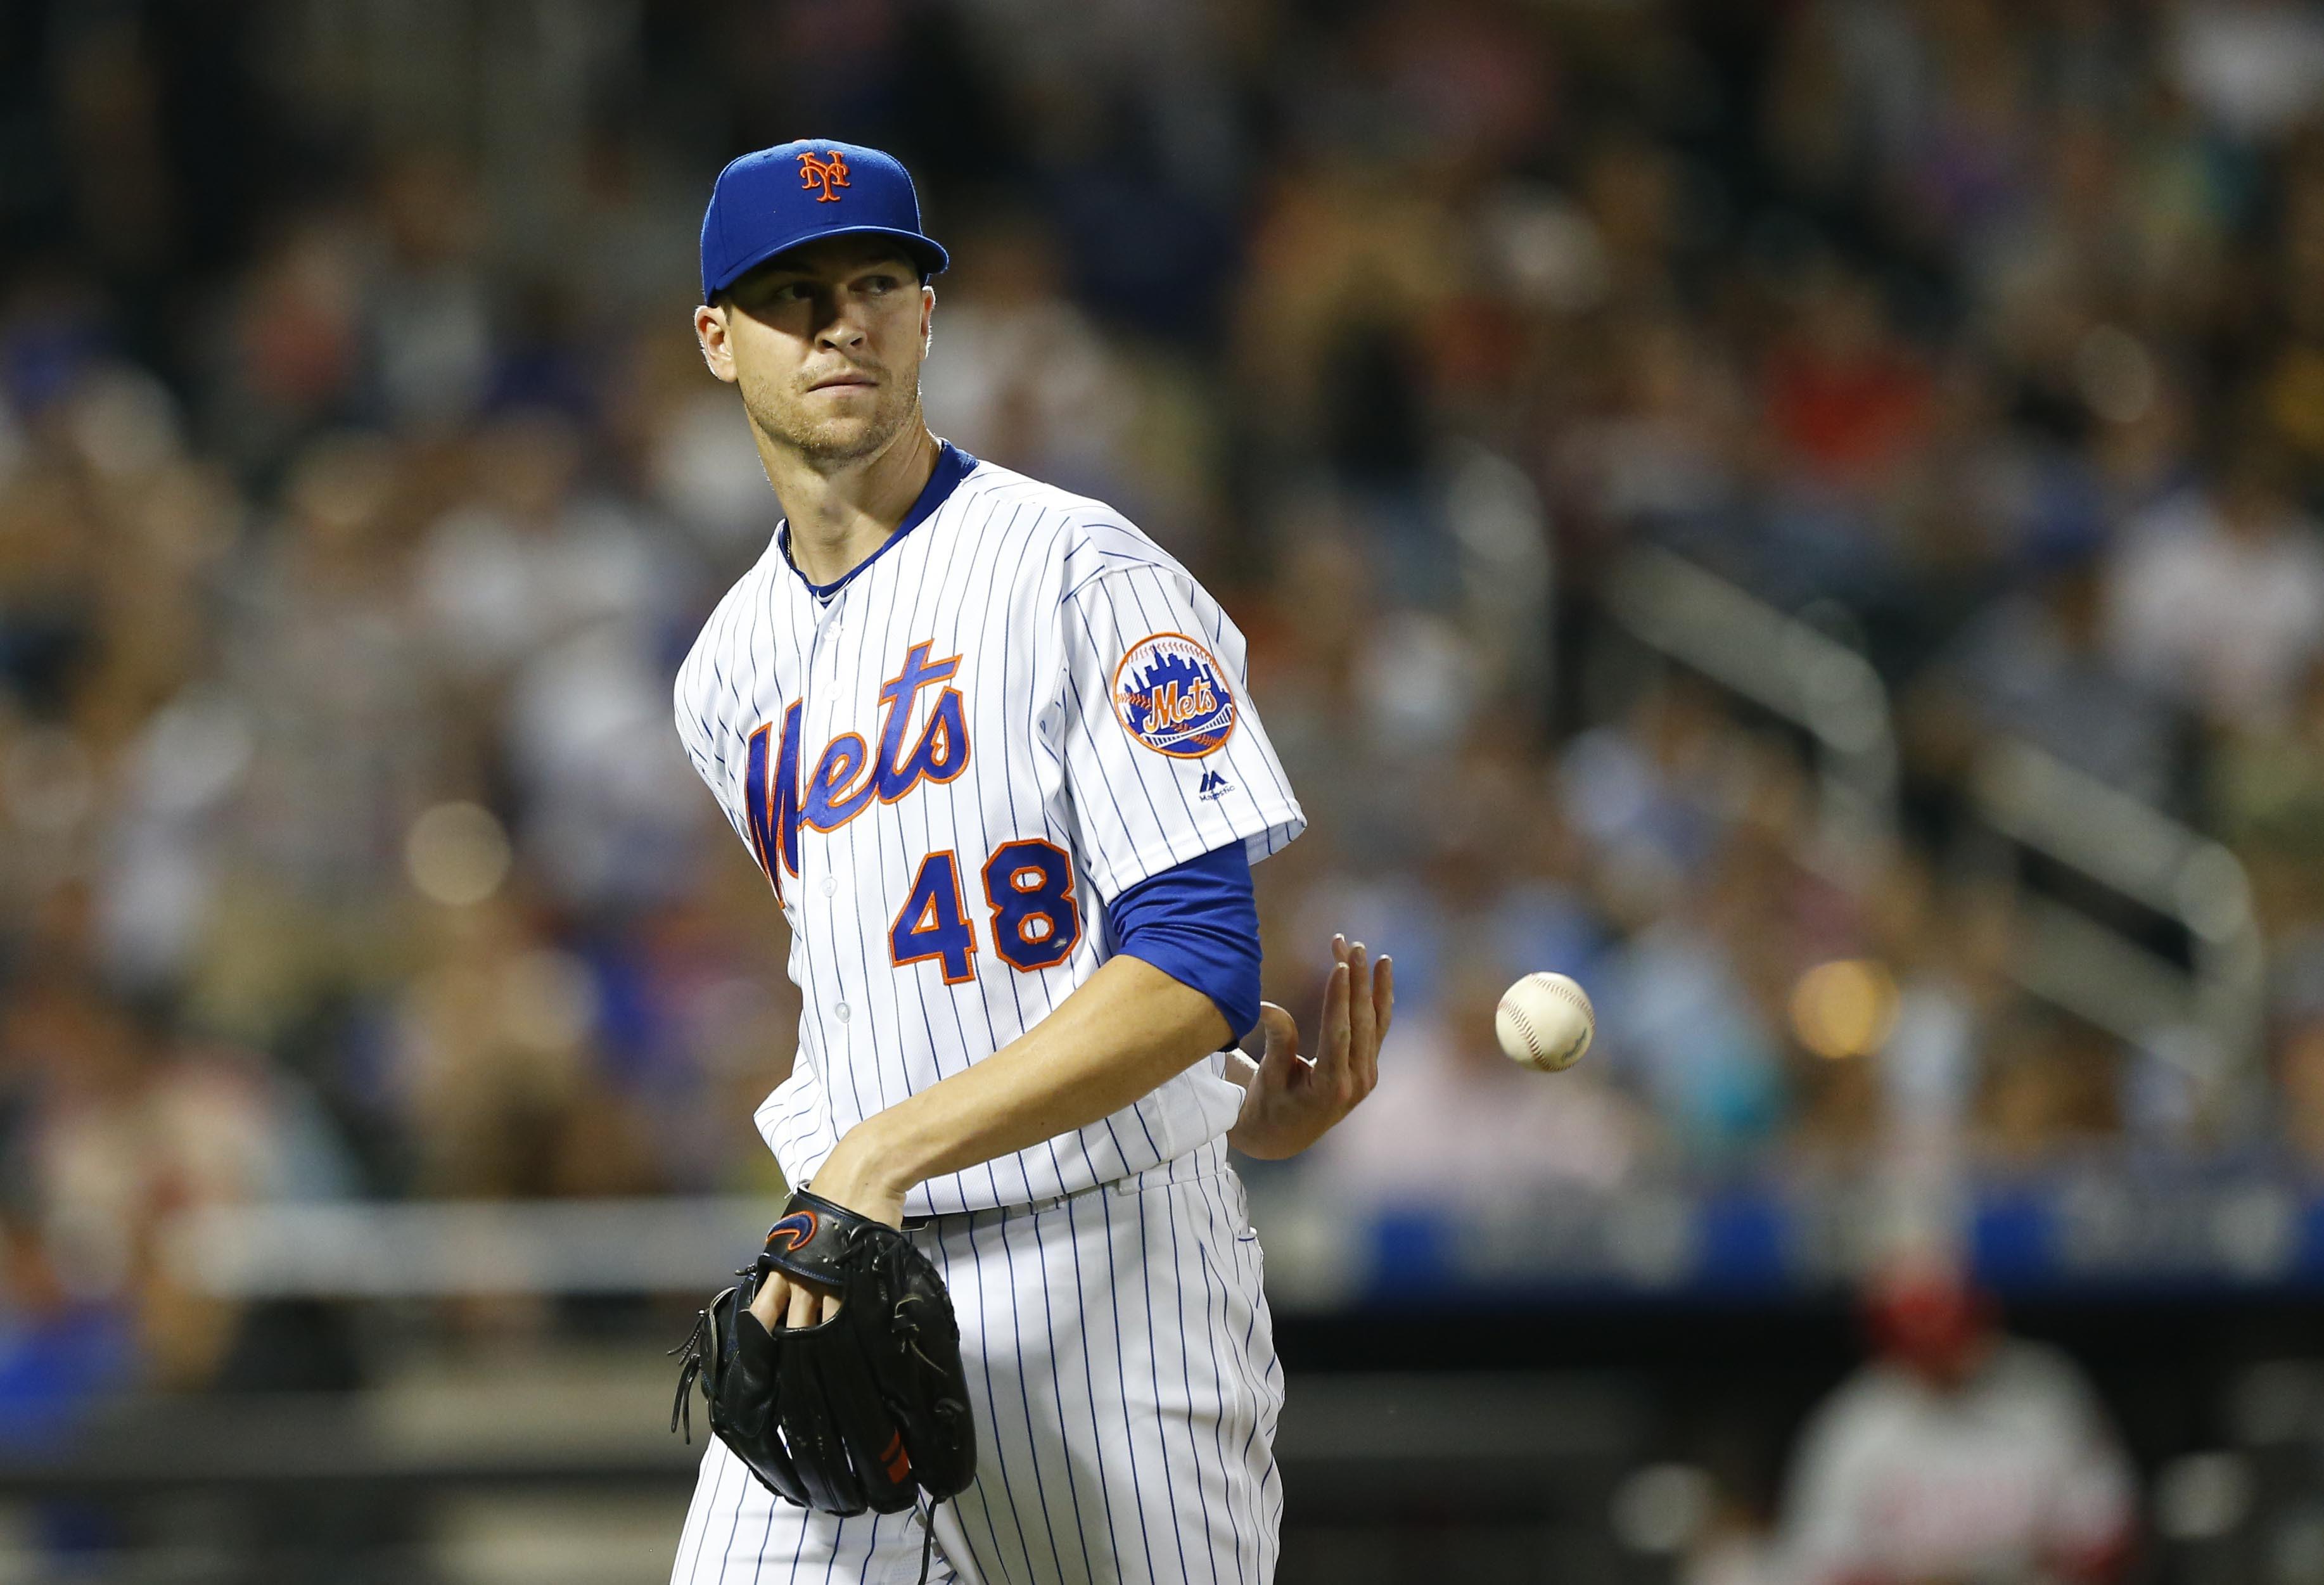 2018 New York Mets' First Half MVP: Jacob deGrom